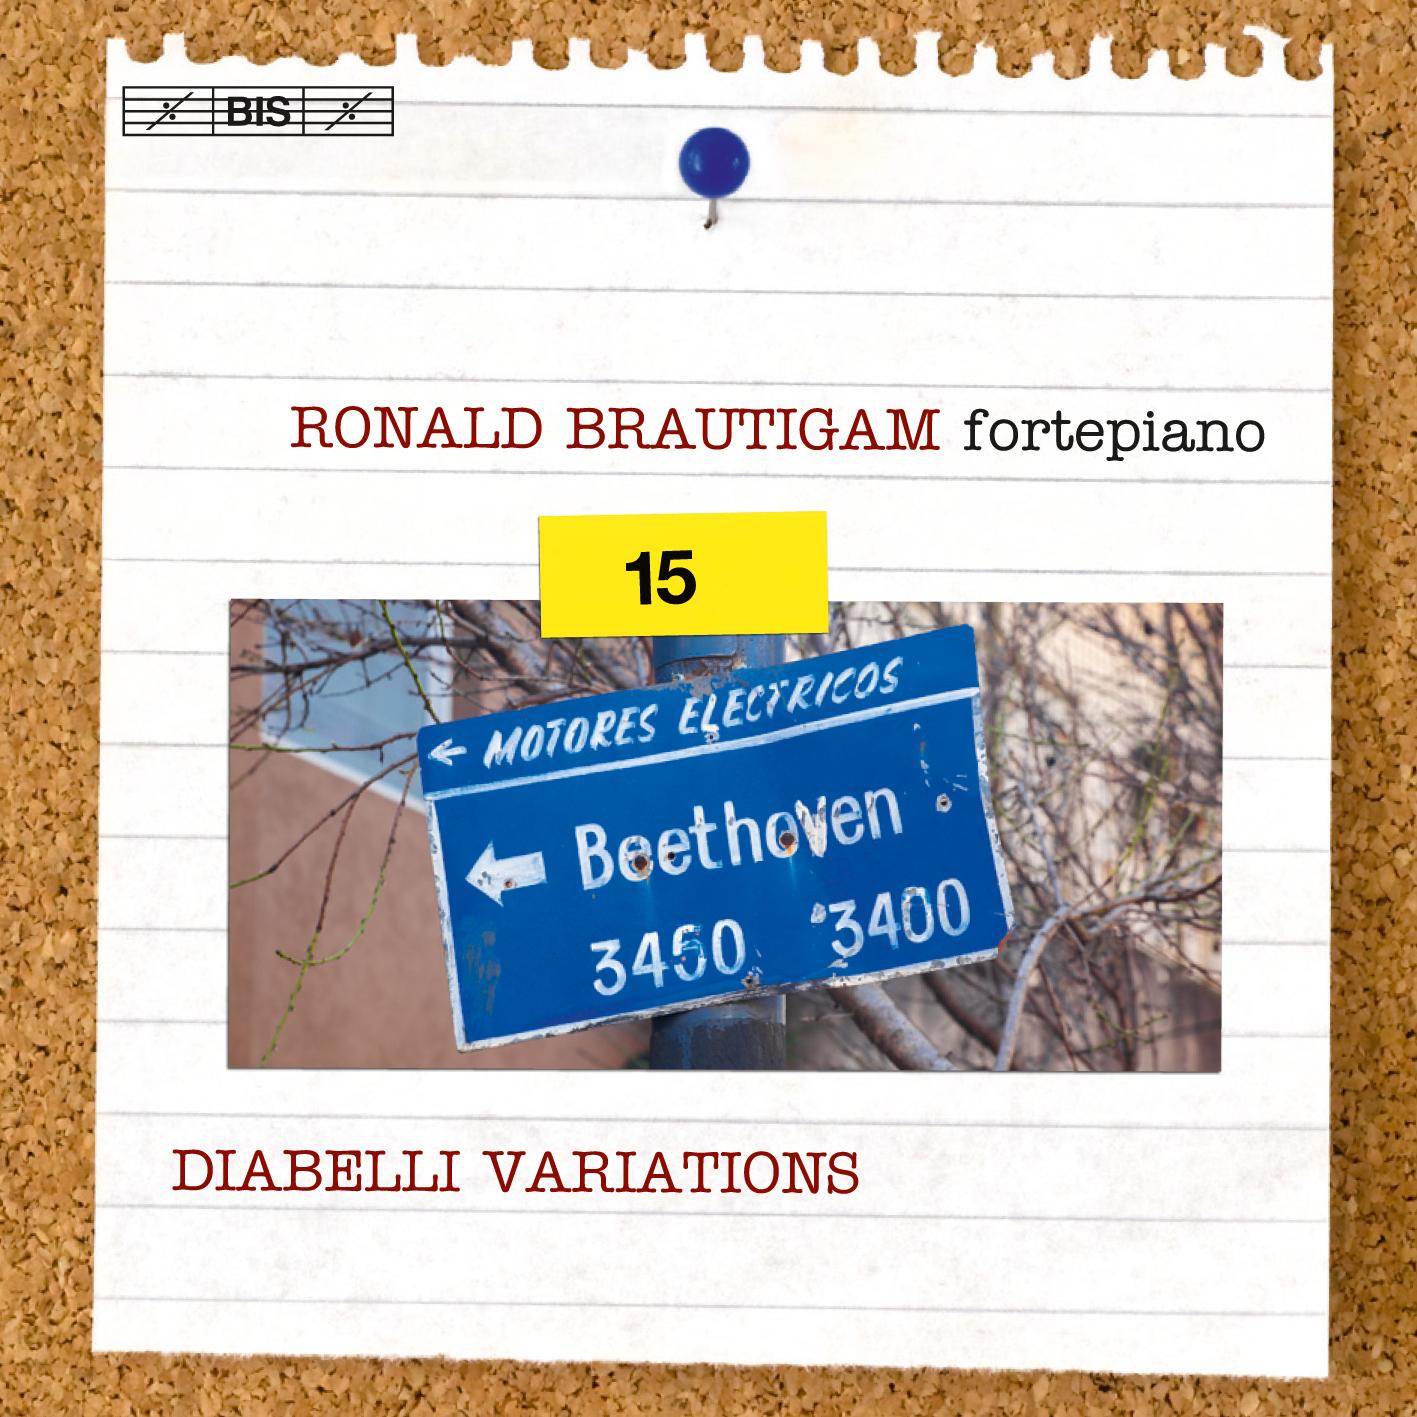 Beethoven, Diabelli Variations, Roland Brautigam